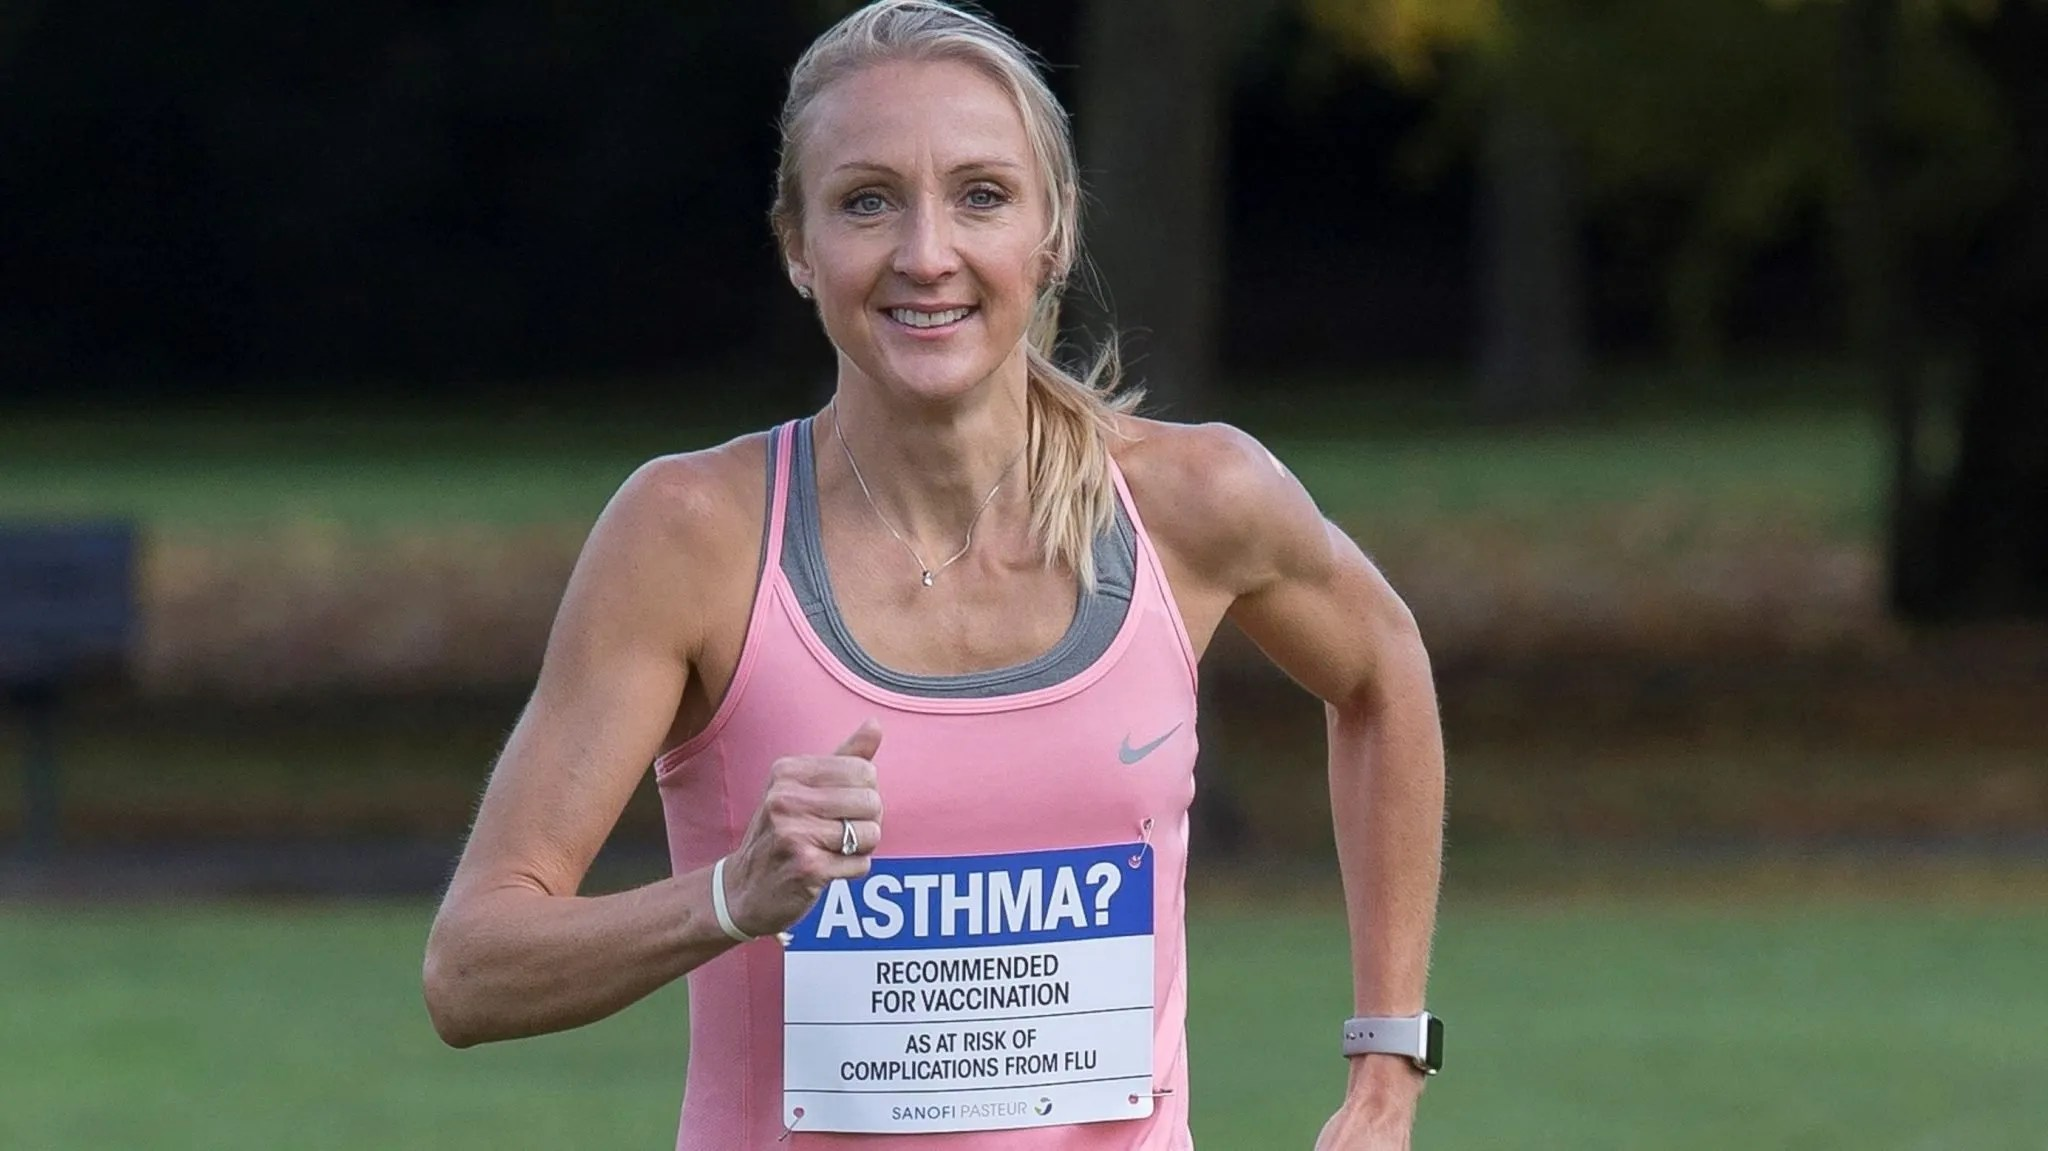 atletas de élite sufren asma